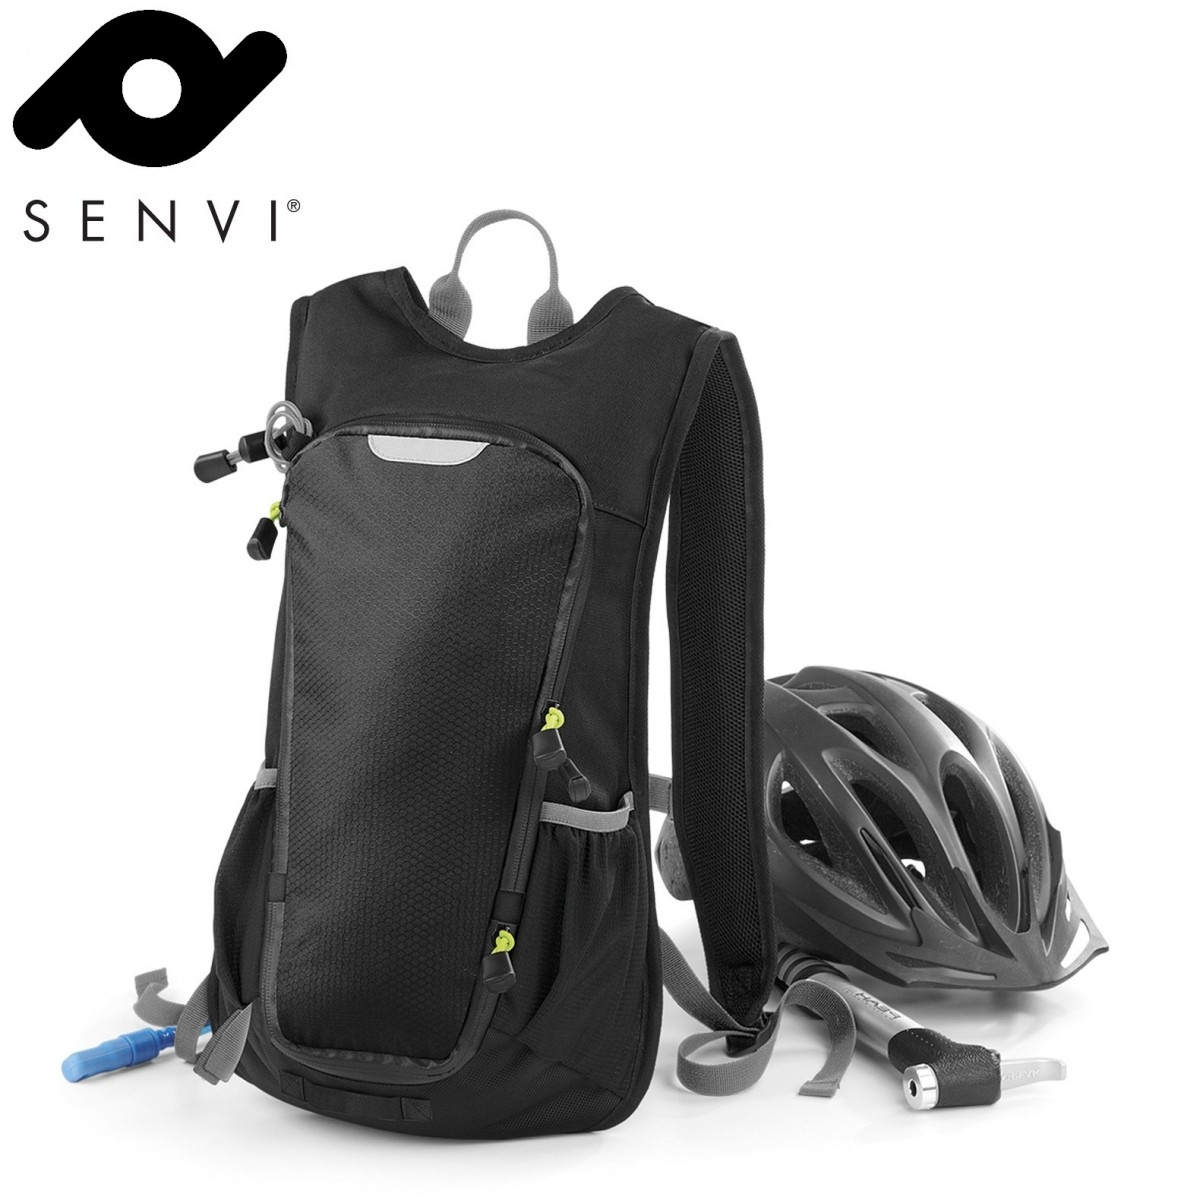 Senvi Ultimate SLX Hydration Sport Rugzak Kleur Zwart/Grijs